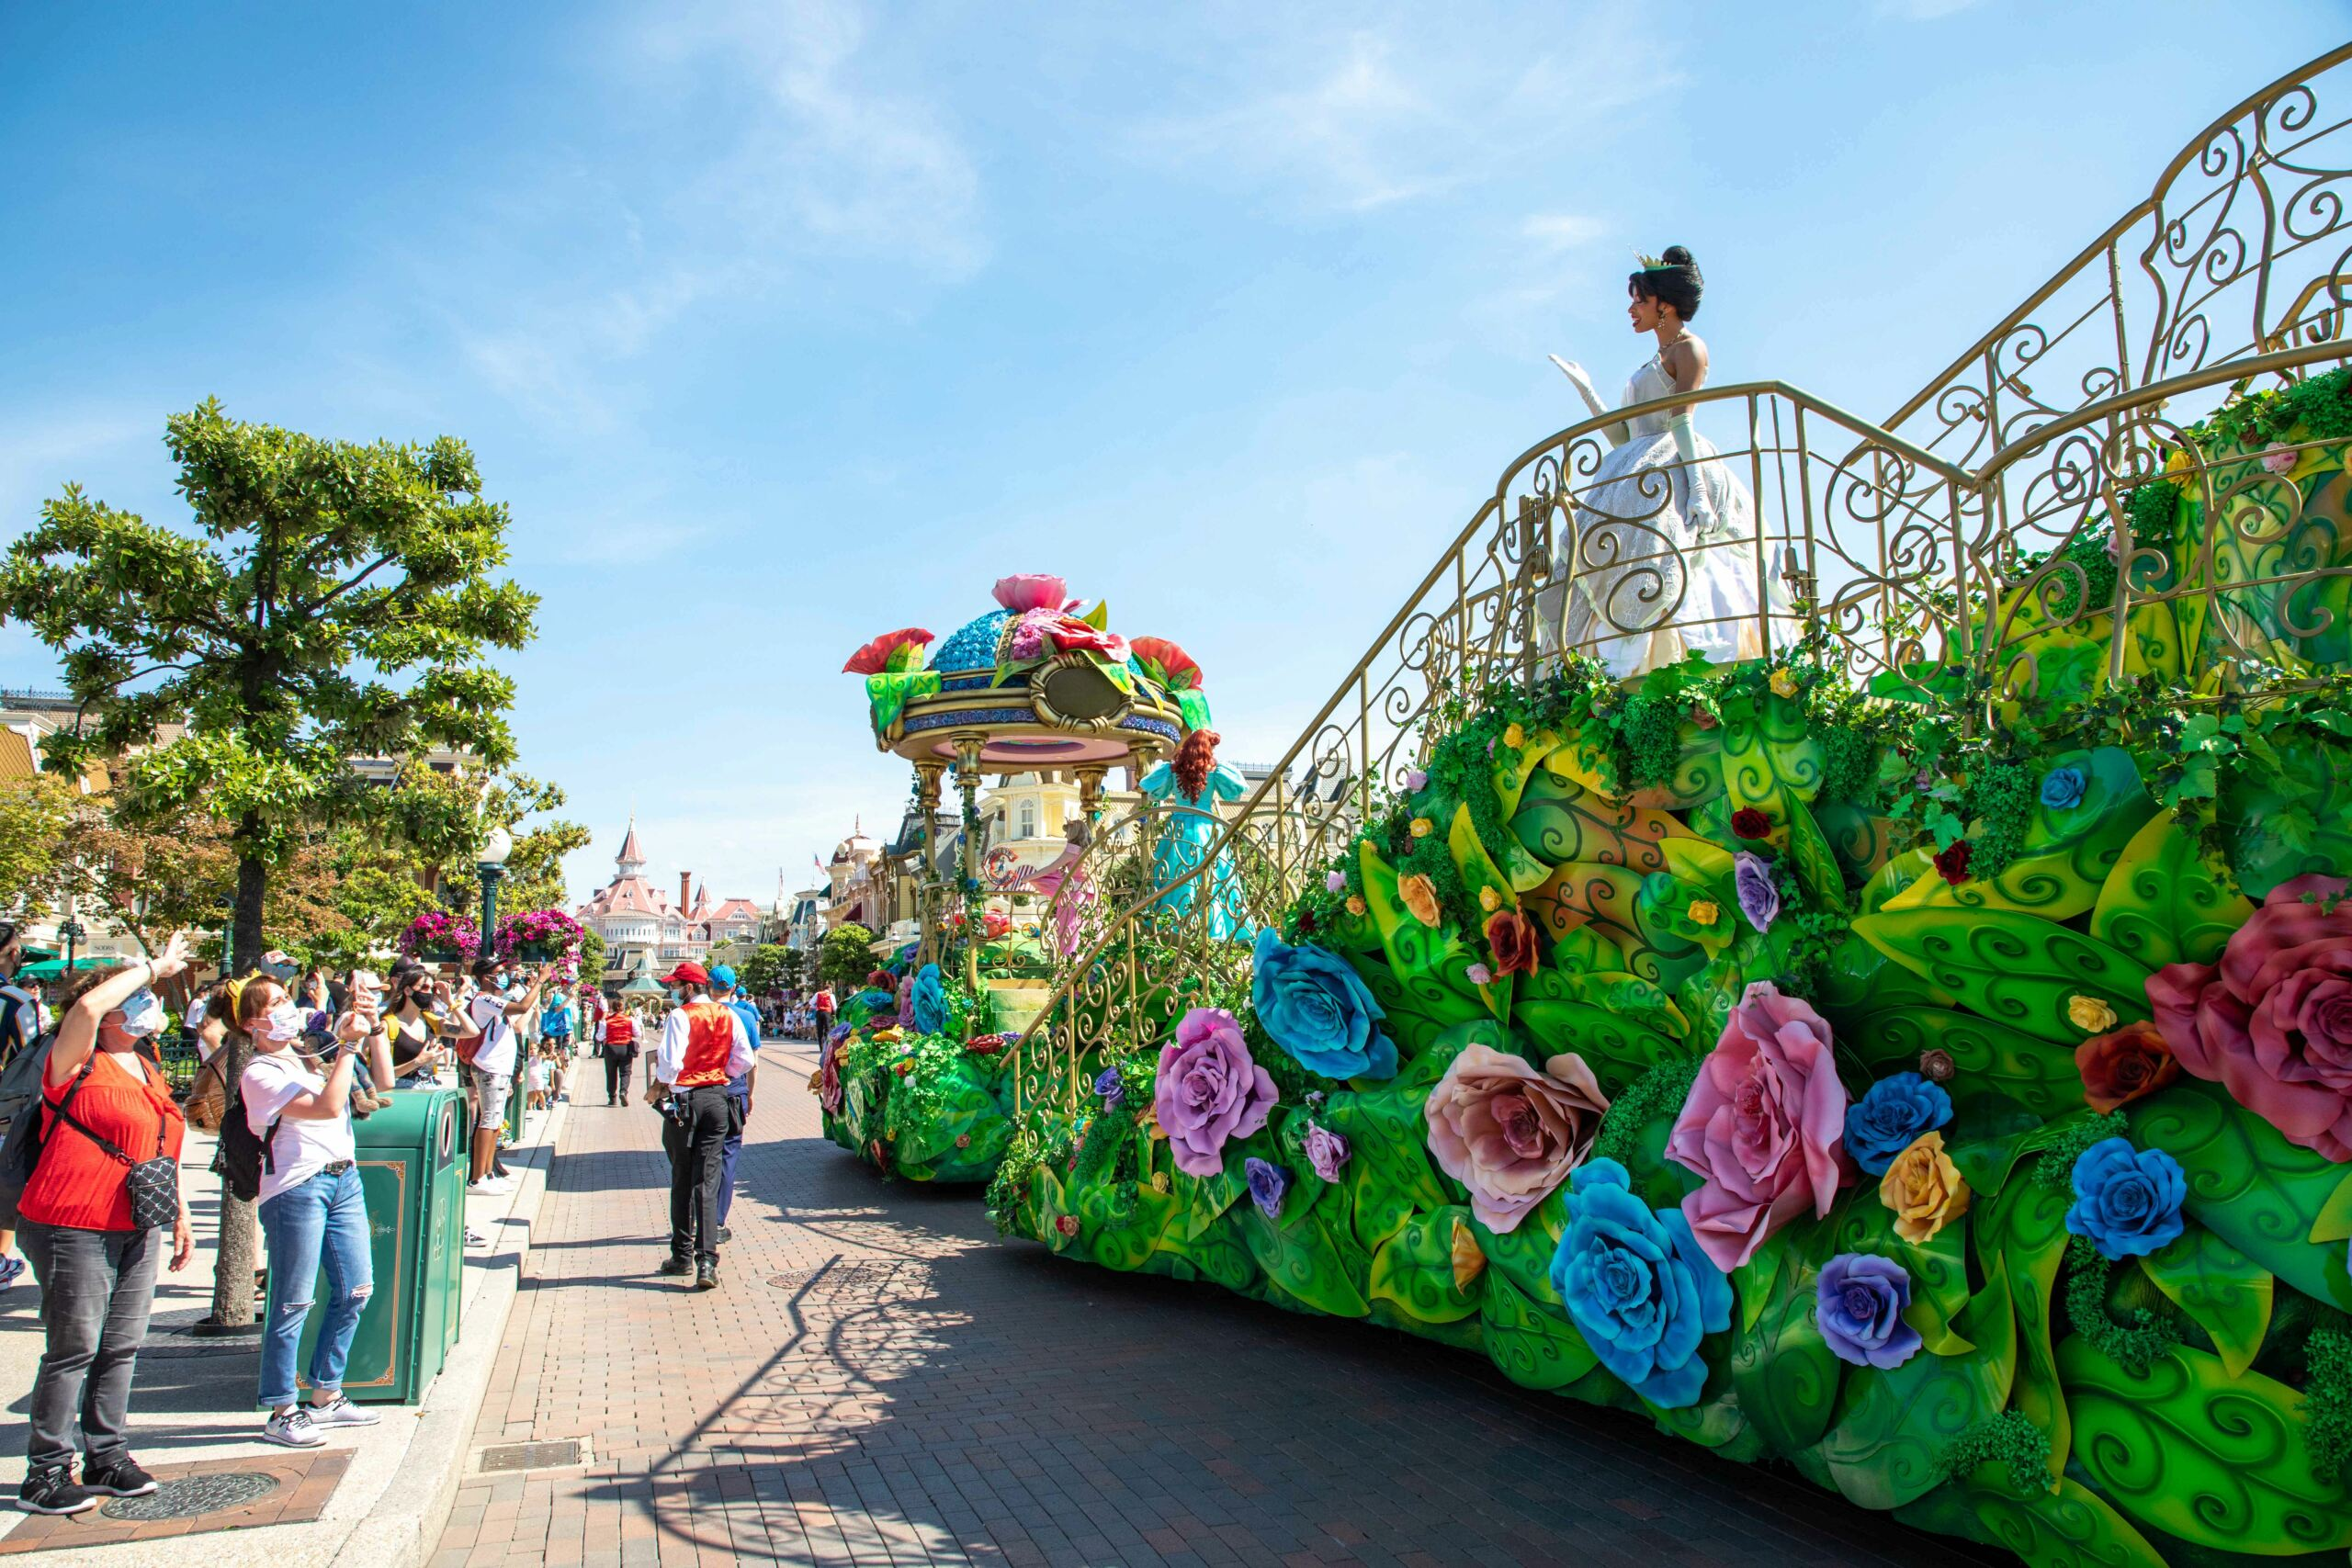 Riapertura di Disneyland Paris - Pagina 12 Enchan10